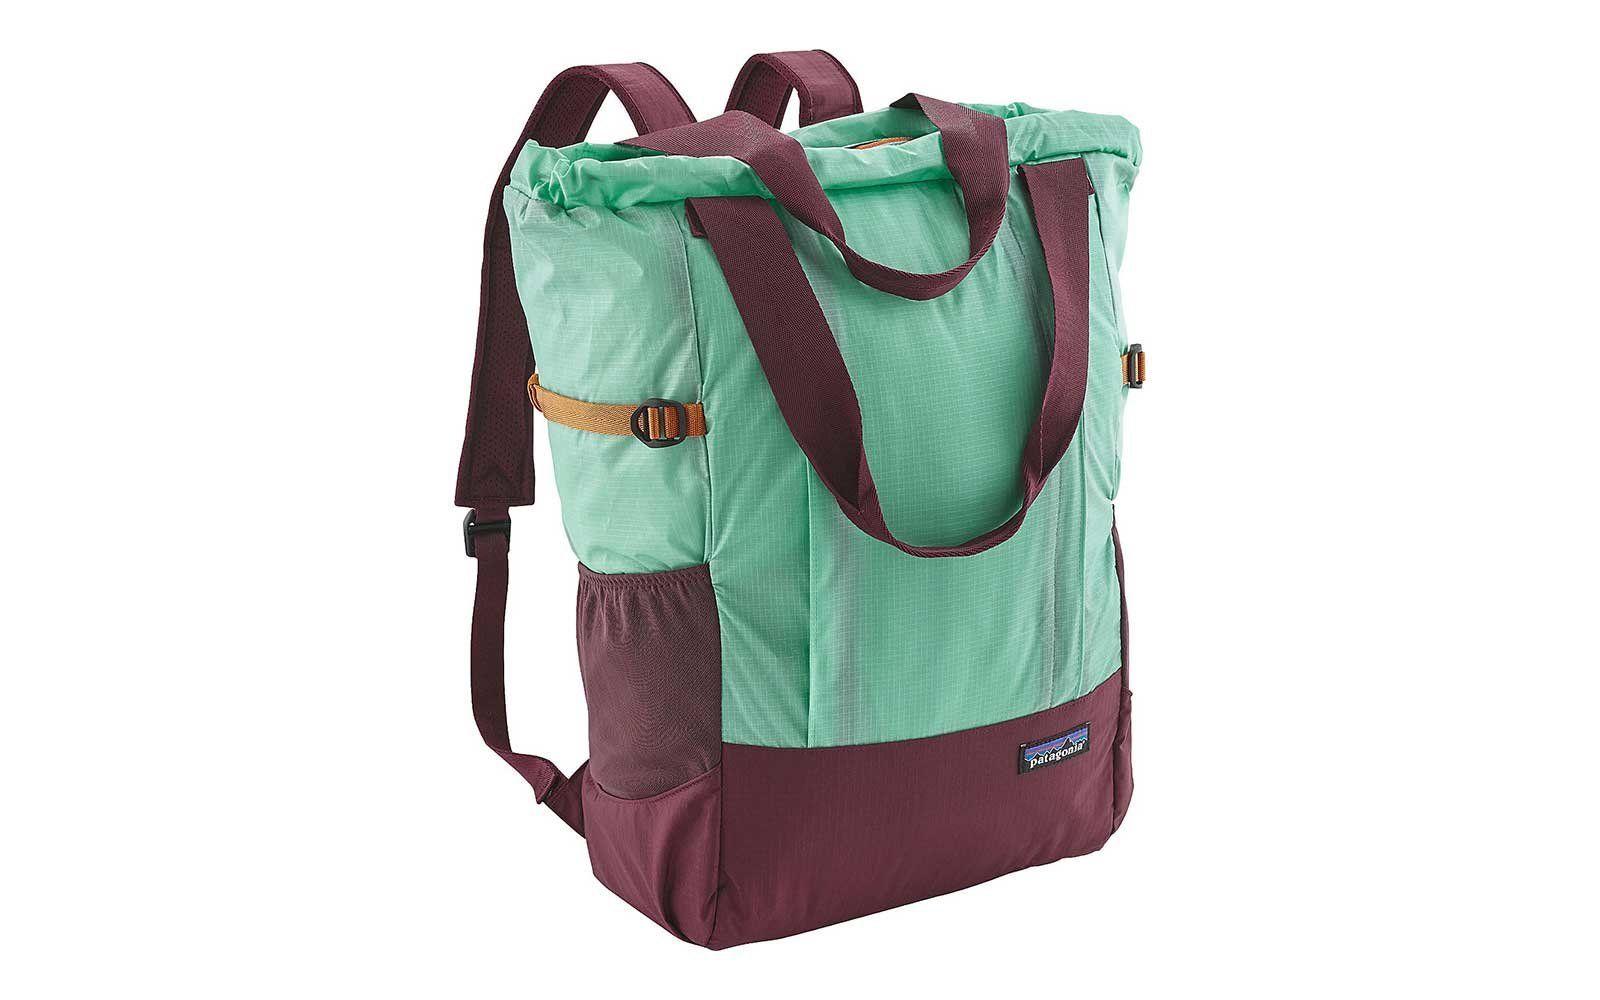 Patagonia Lightweight Travel Tote Bag Big Sur Blue